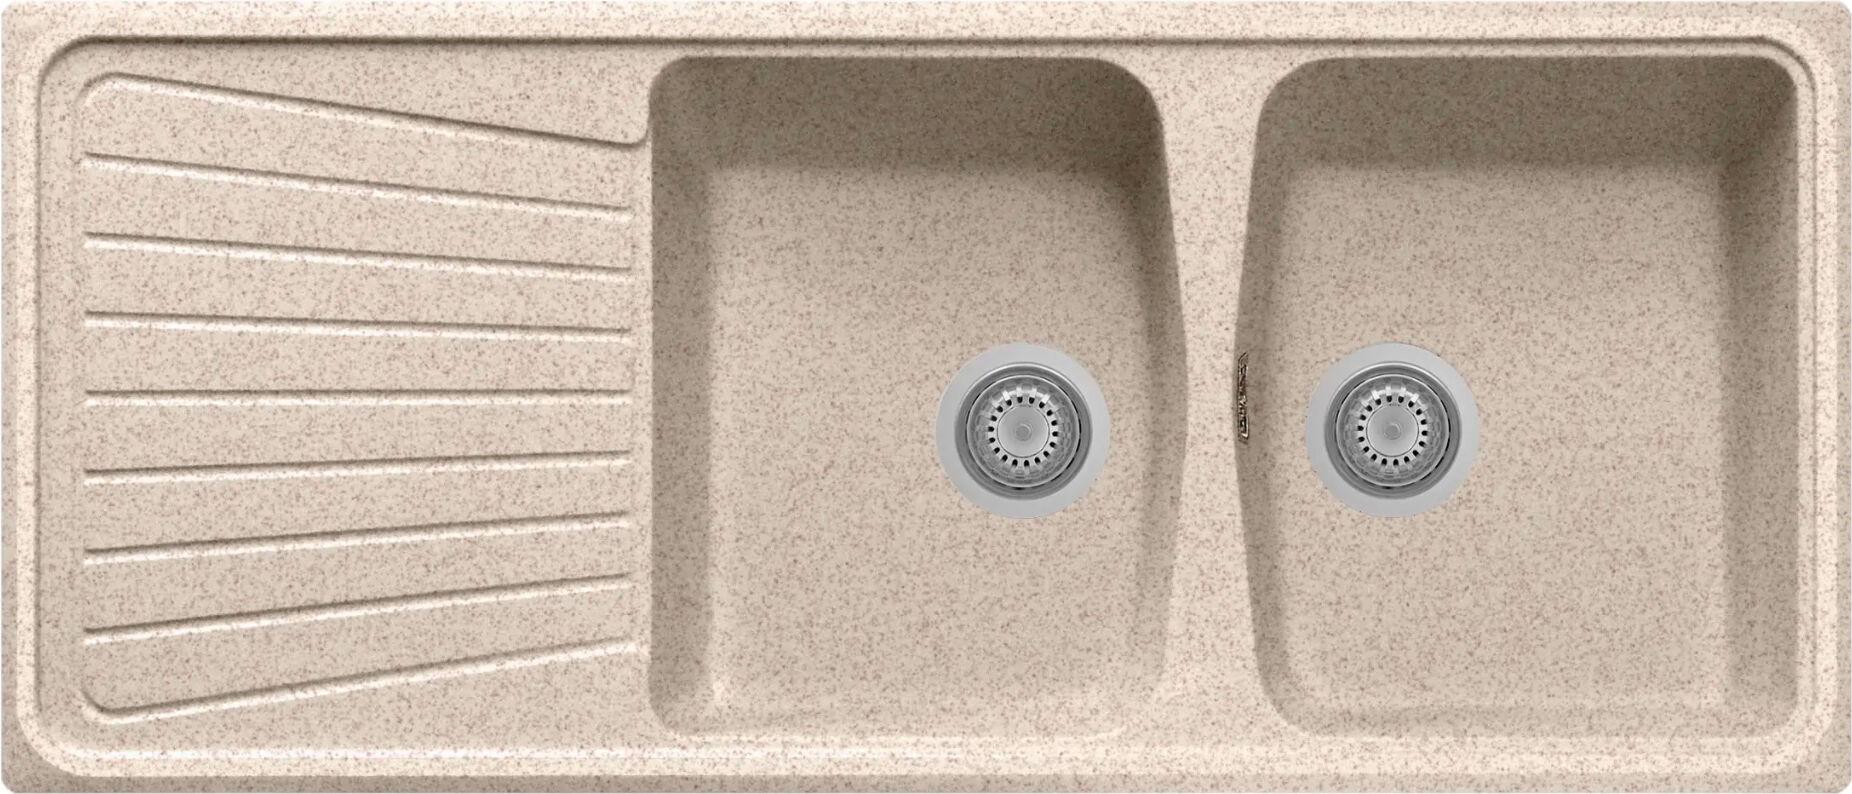 plados Sp1162ug94 Lavello Fragranite Cucina Incasso 2 Vasche Con Gocciolatoio Larghezza 116 Cm Materiale Ultragranit Colore Avena Ug94 - Sp1162 Serie Spazio